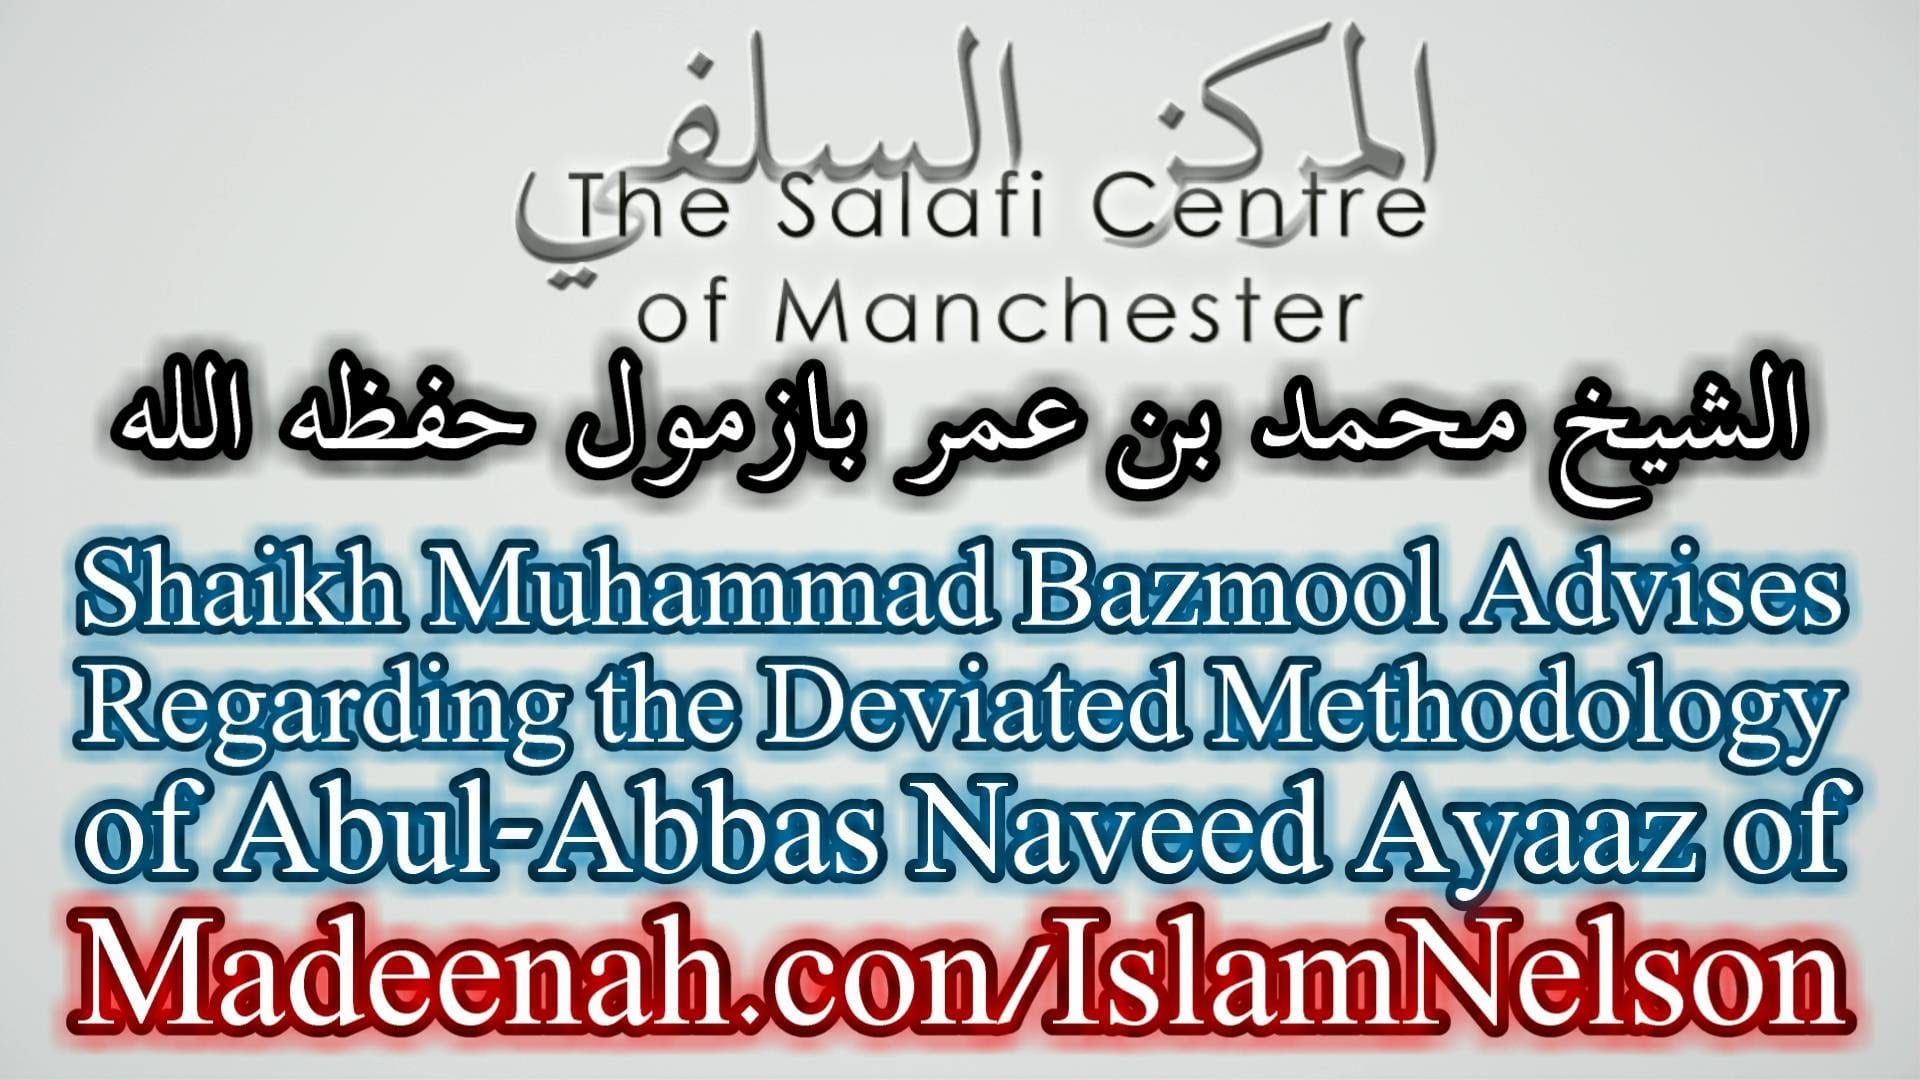 Shaykh Muhammad Bazmool Advises Regarding the Deviated Methodology of Abul-Abbas Naveed Ayaaz